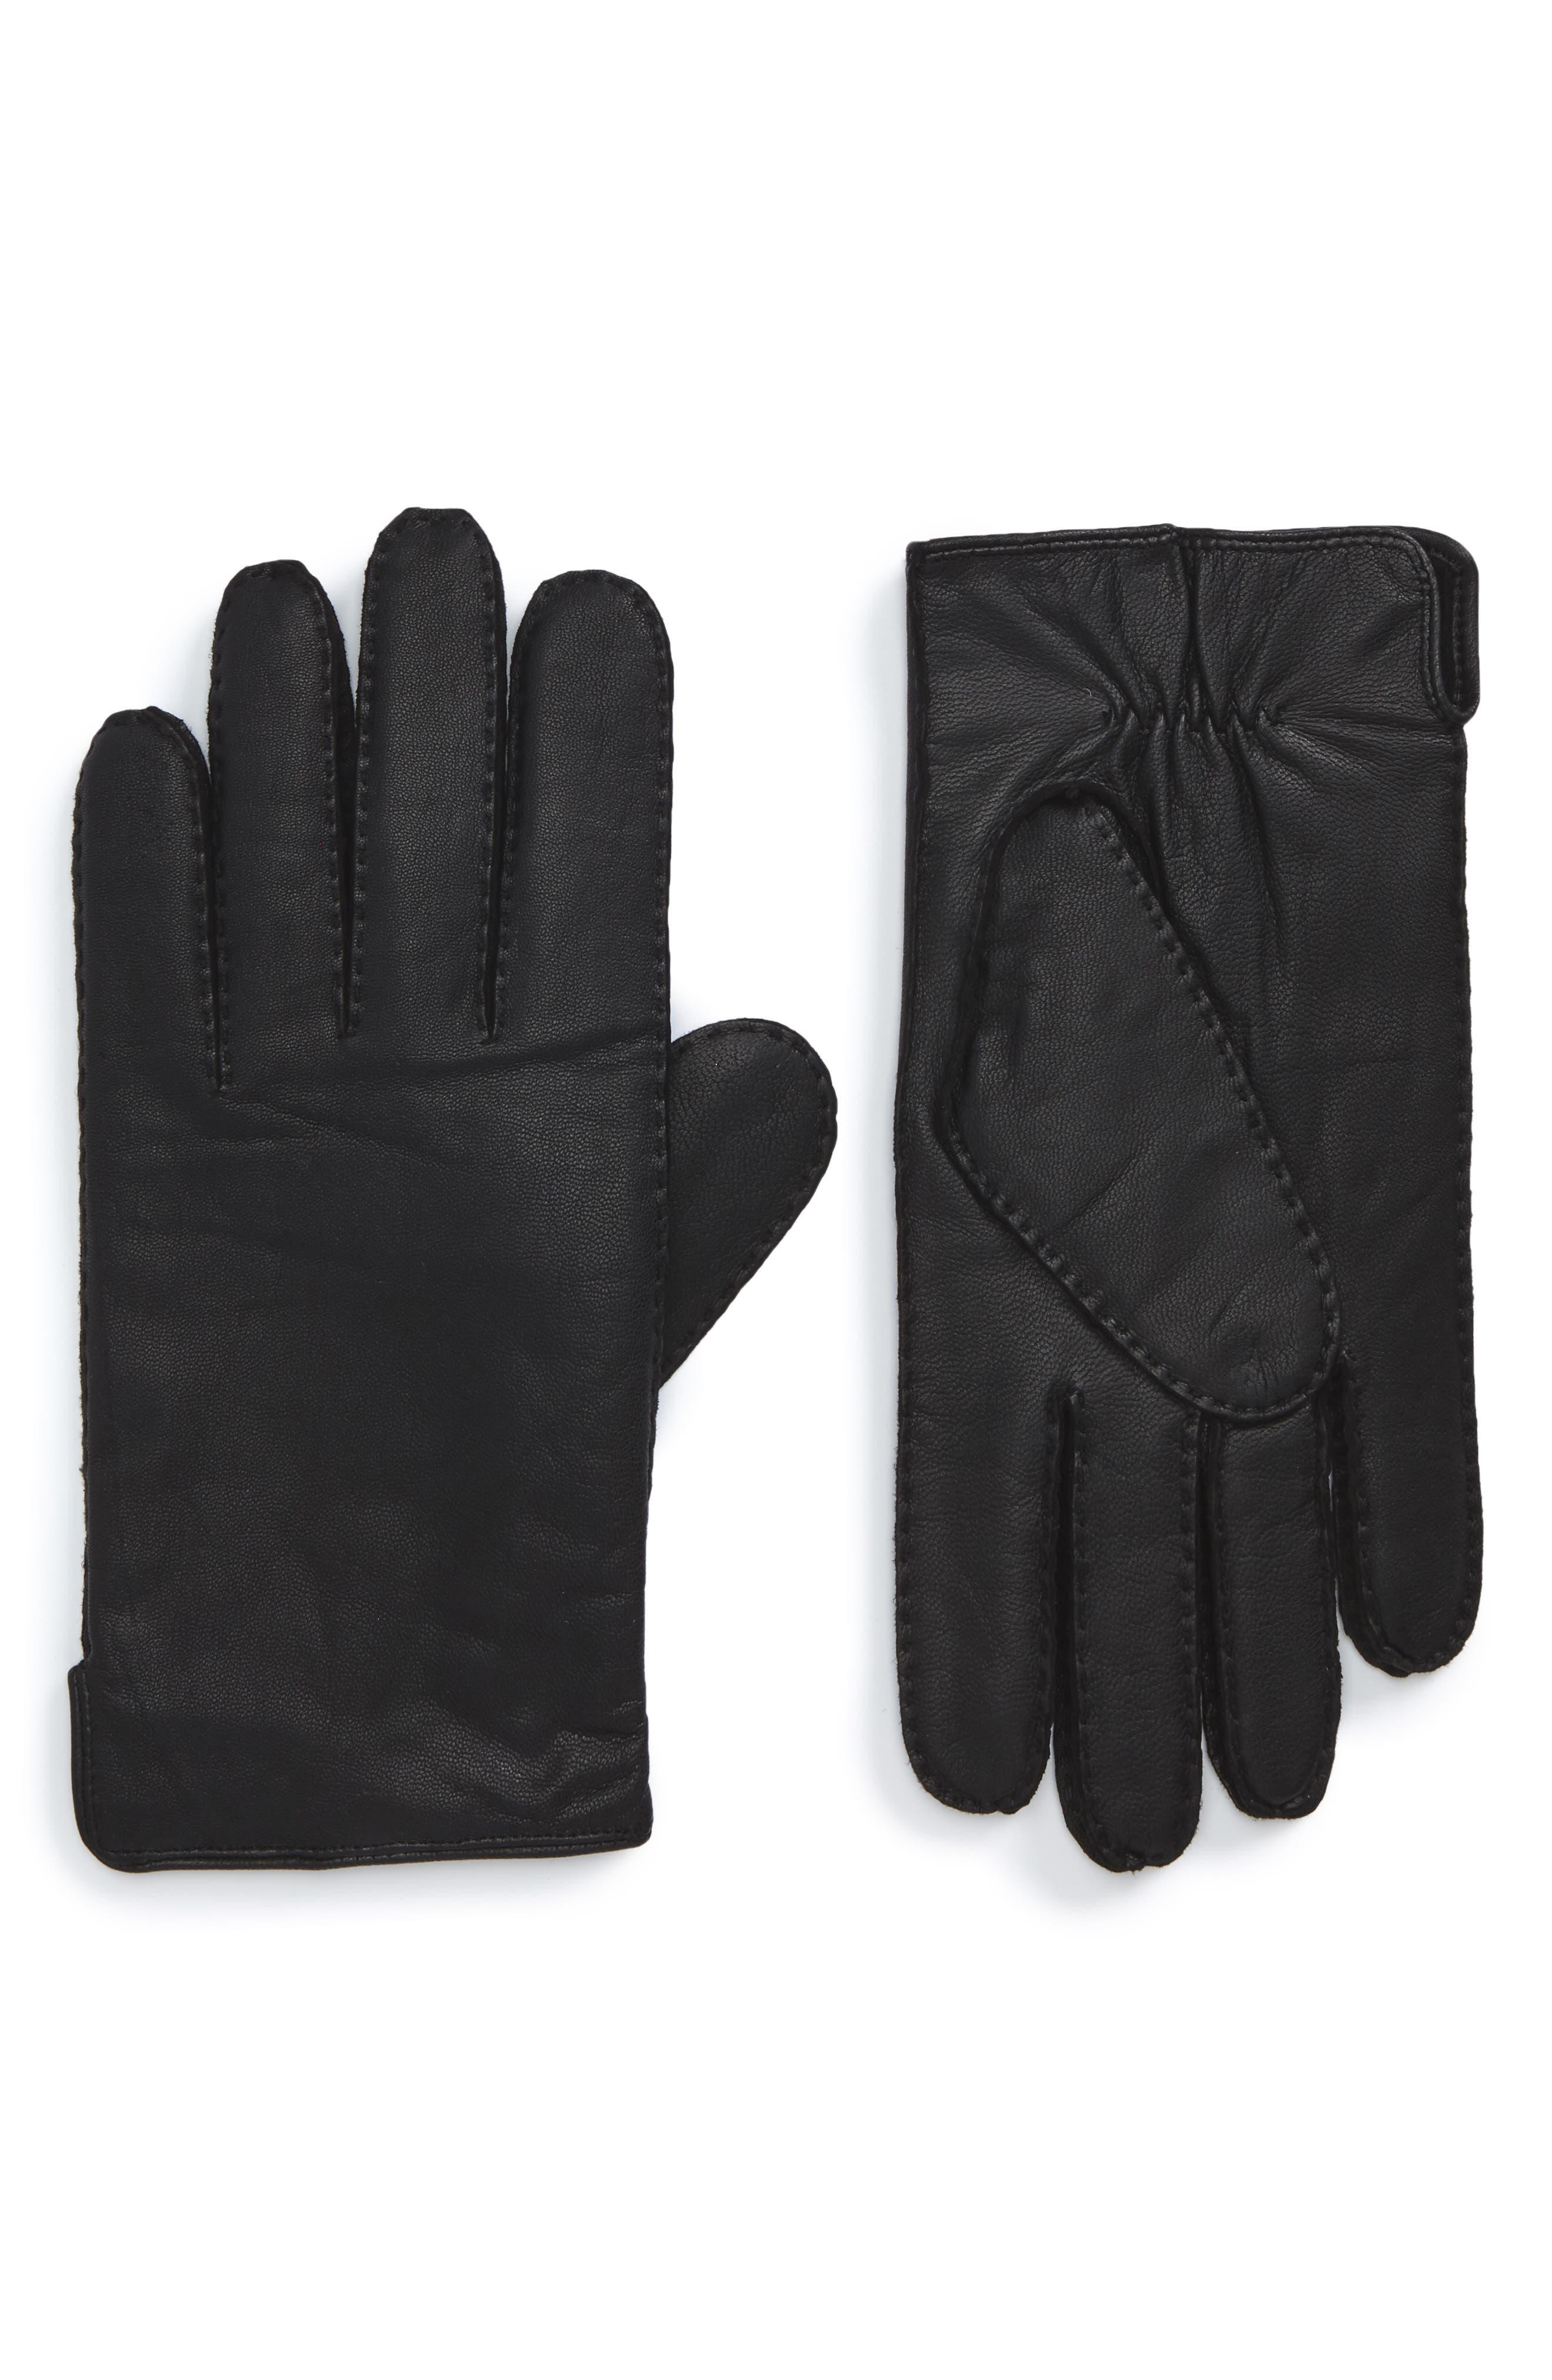 Kanton Leather Gloves,                             Main thumbnail 1, color,